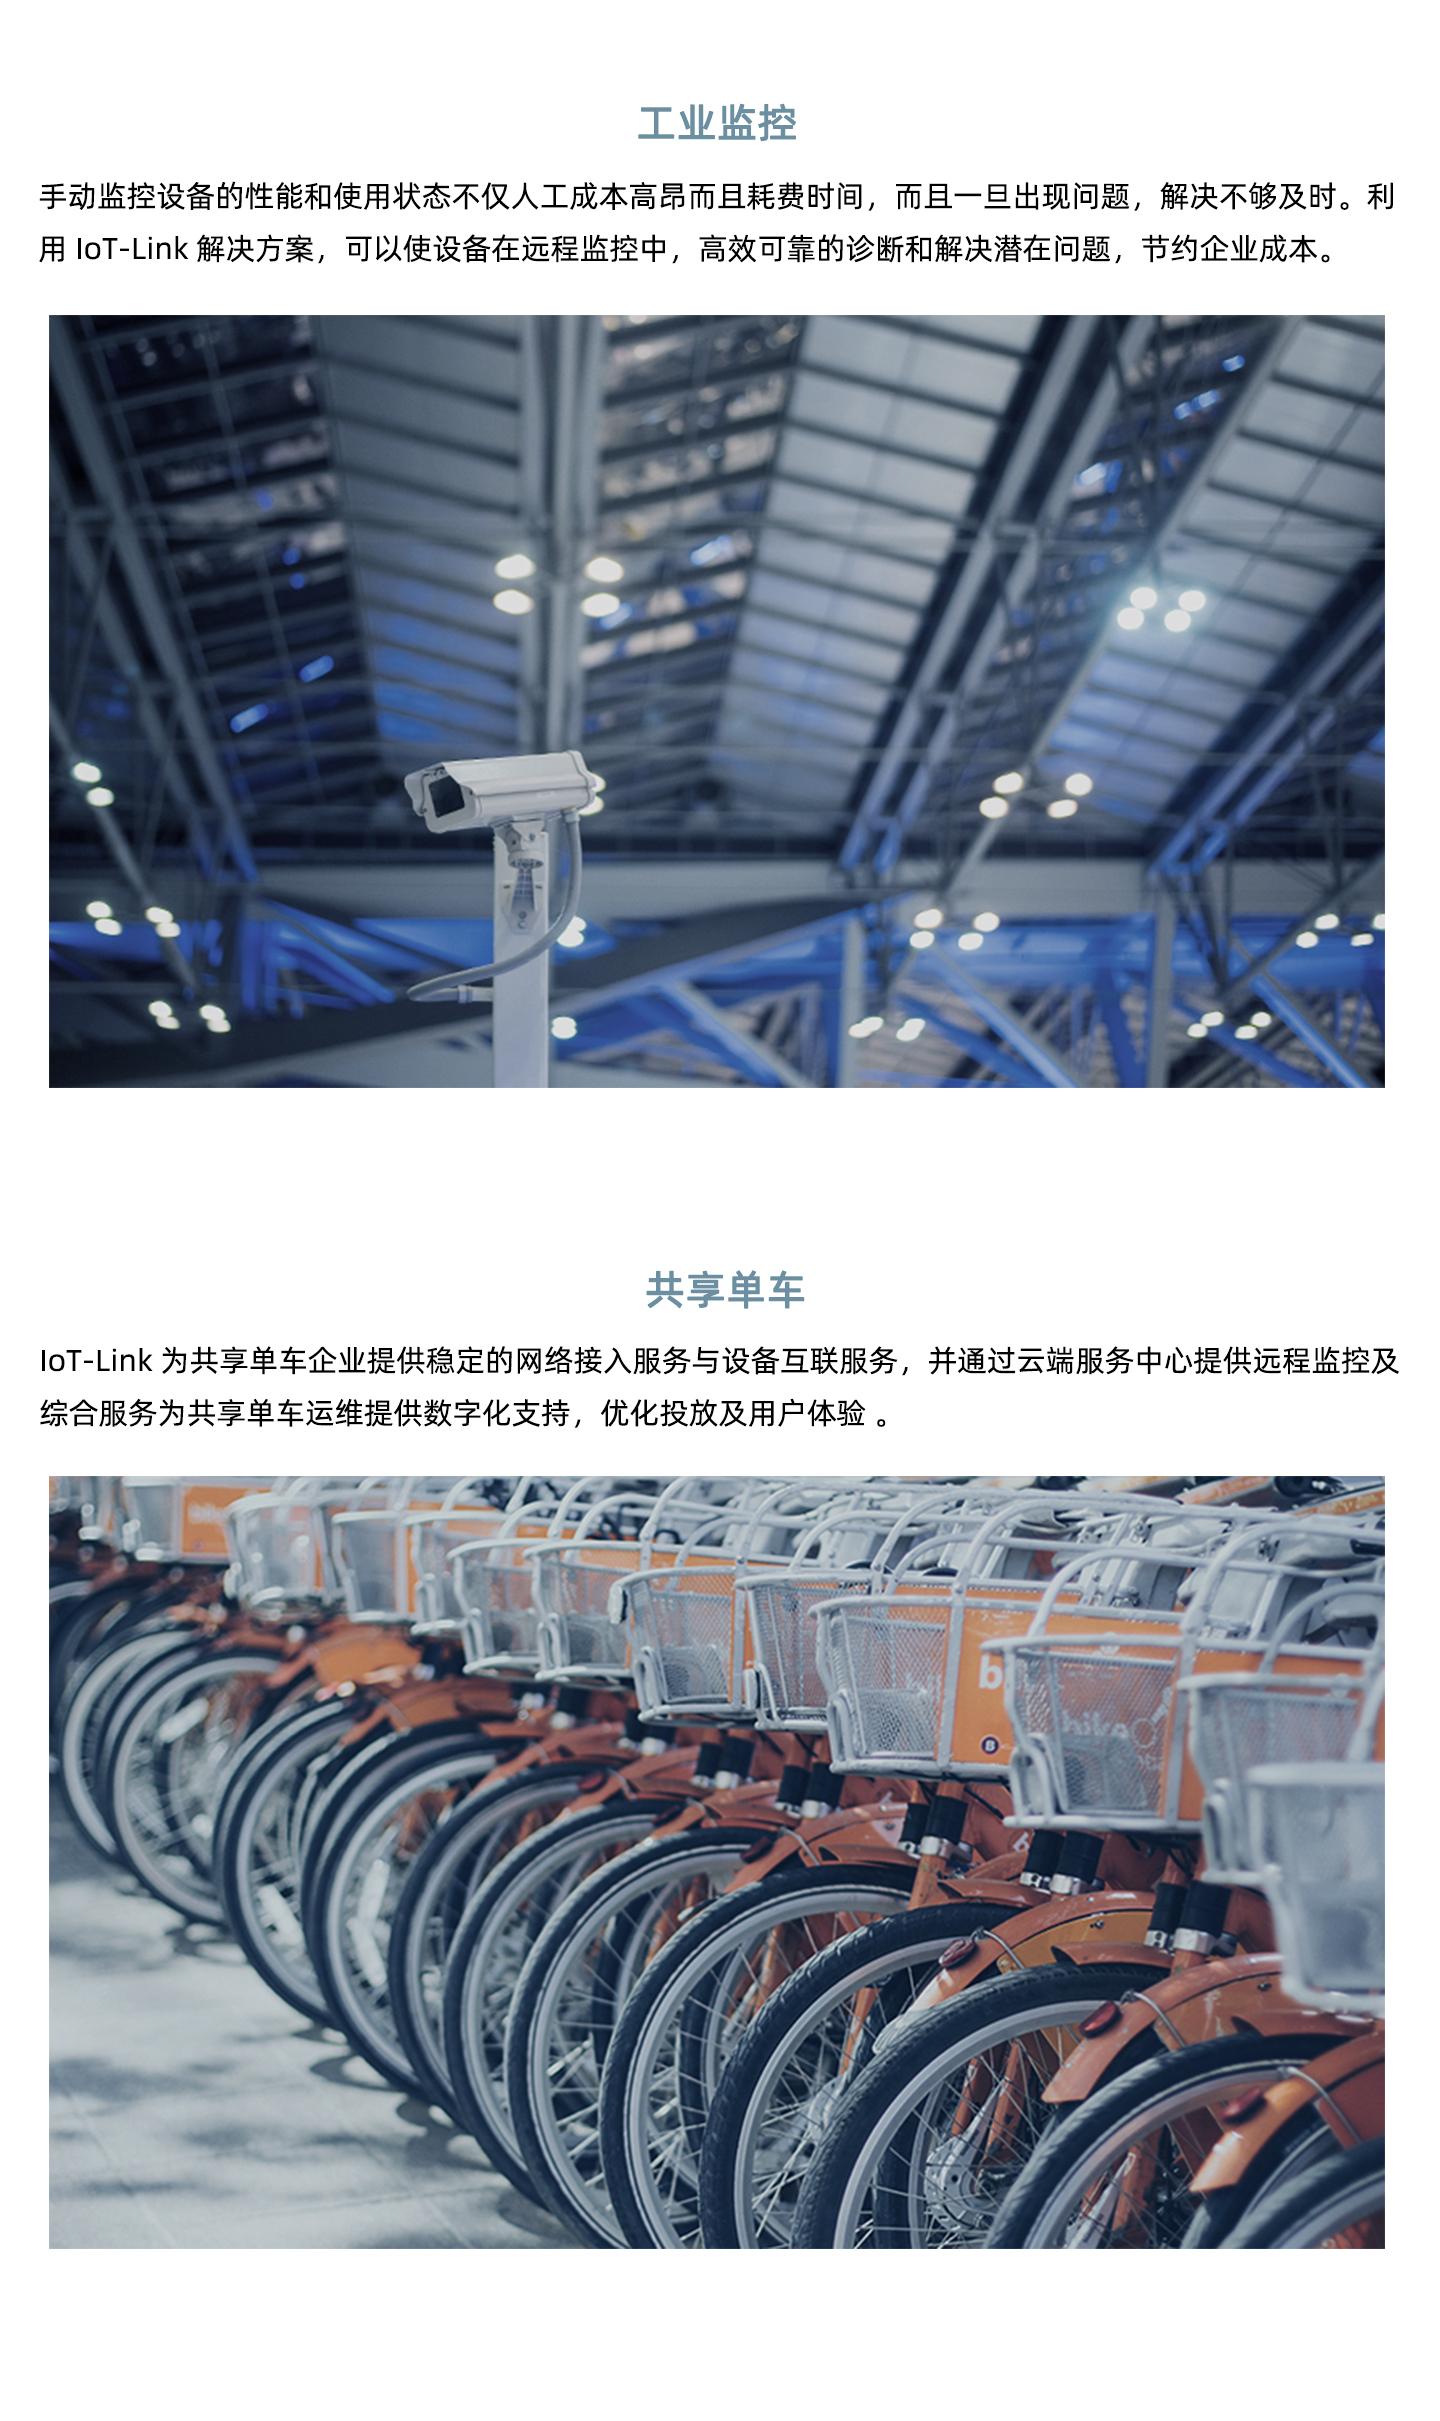 物联卡-IoT-Link-1440_04.jpg